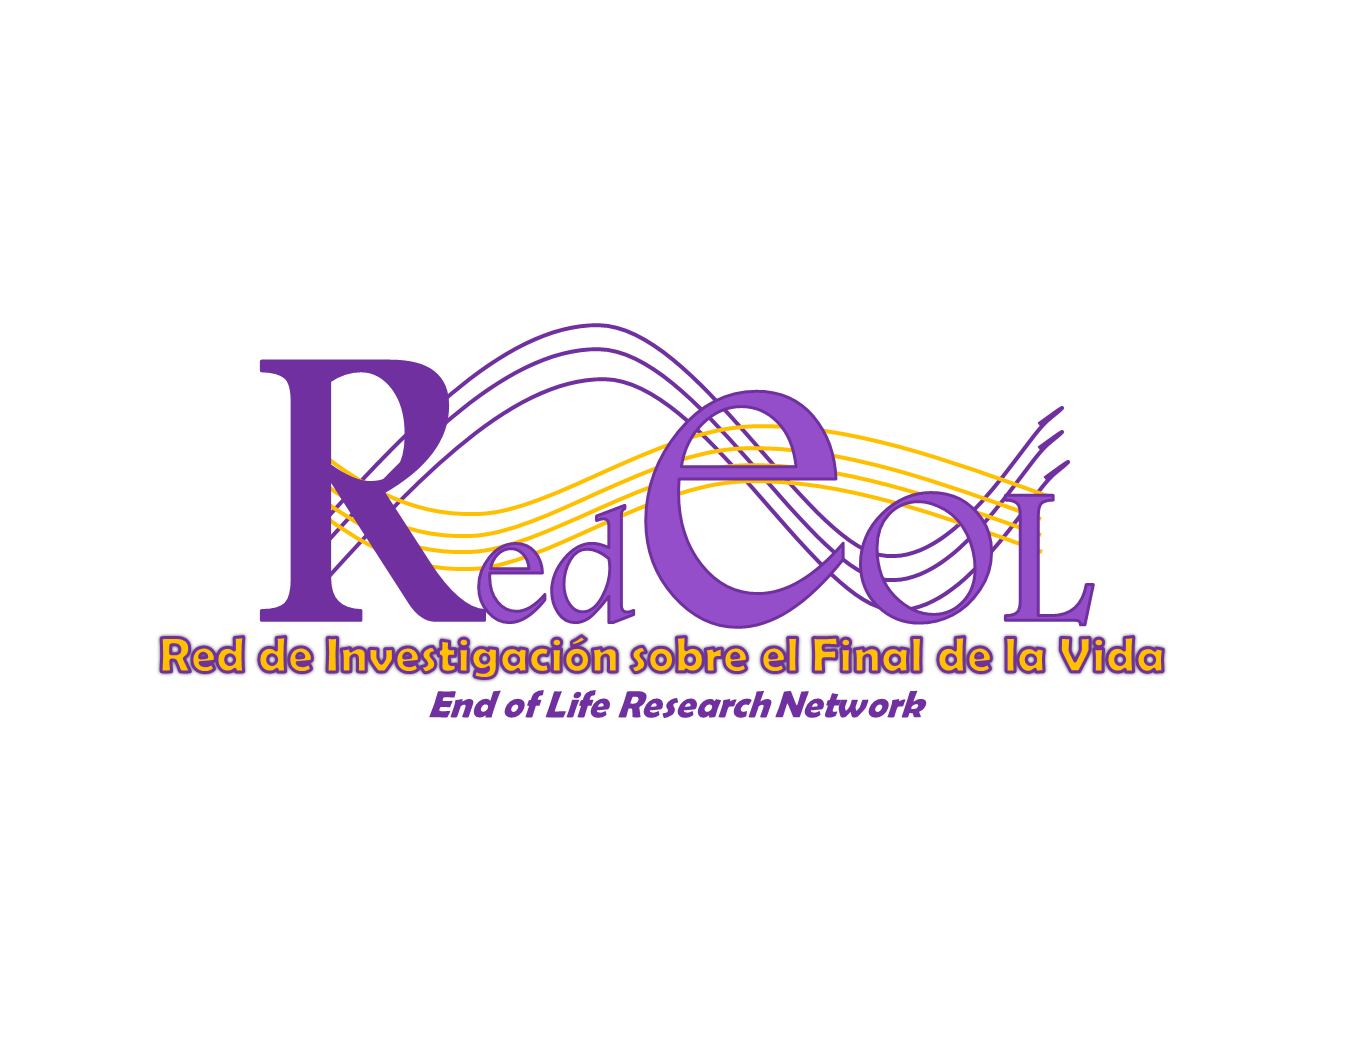 logo red eol